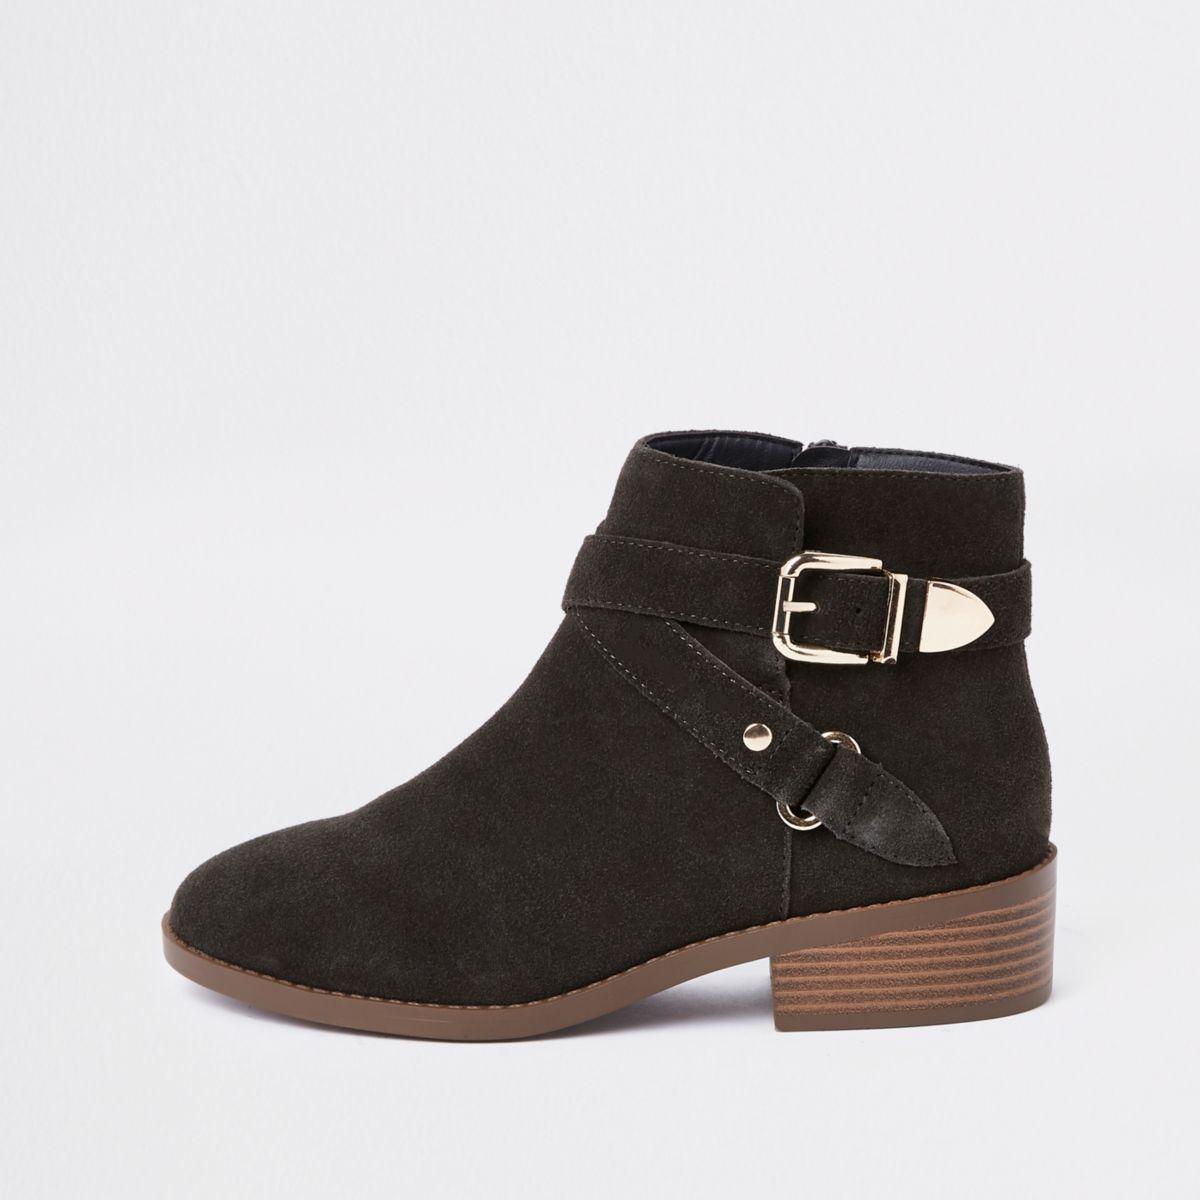 Dark grey suede buckle ankle boots